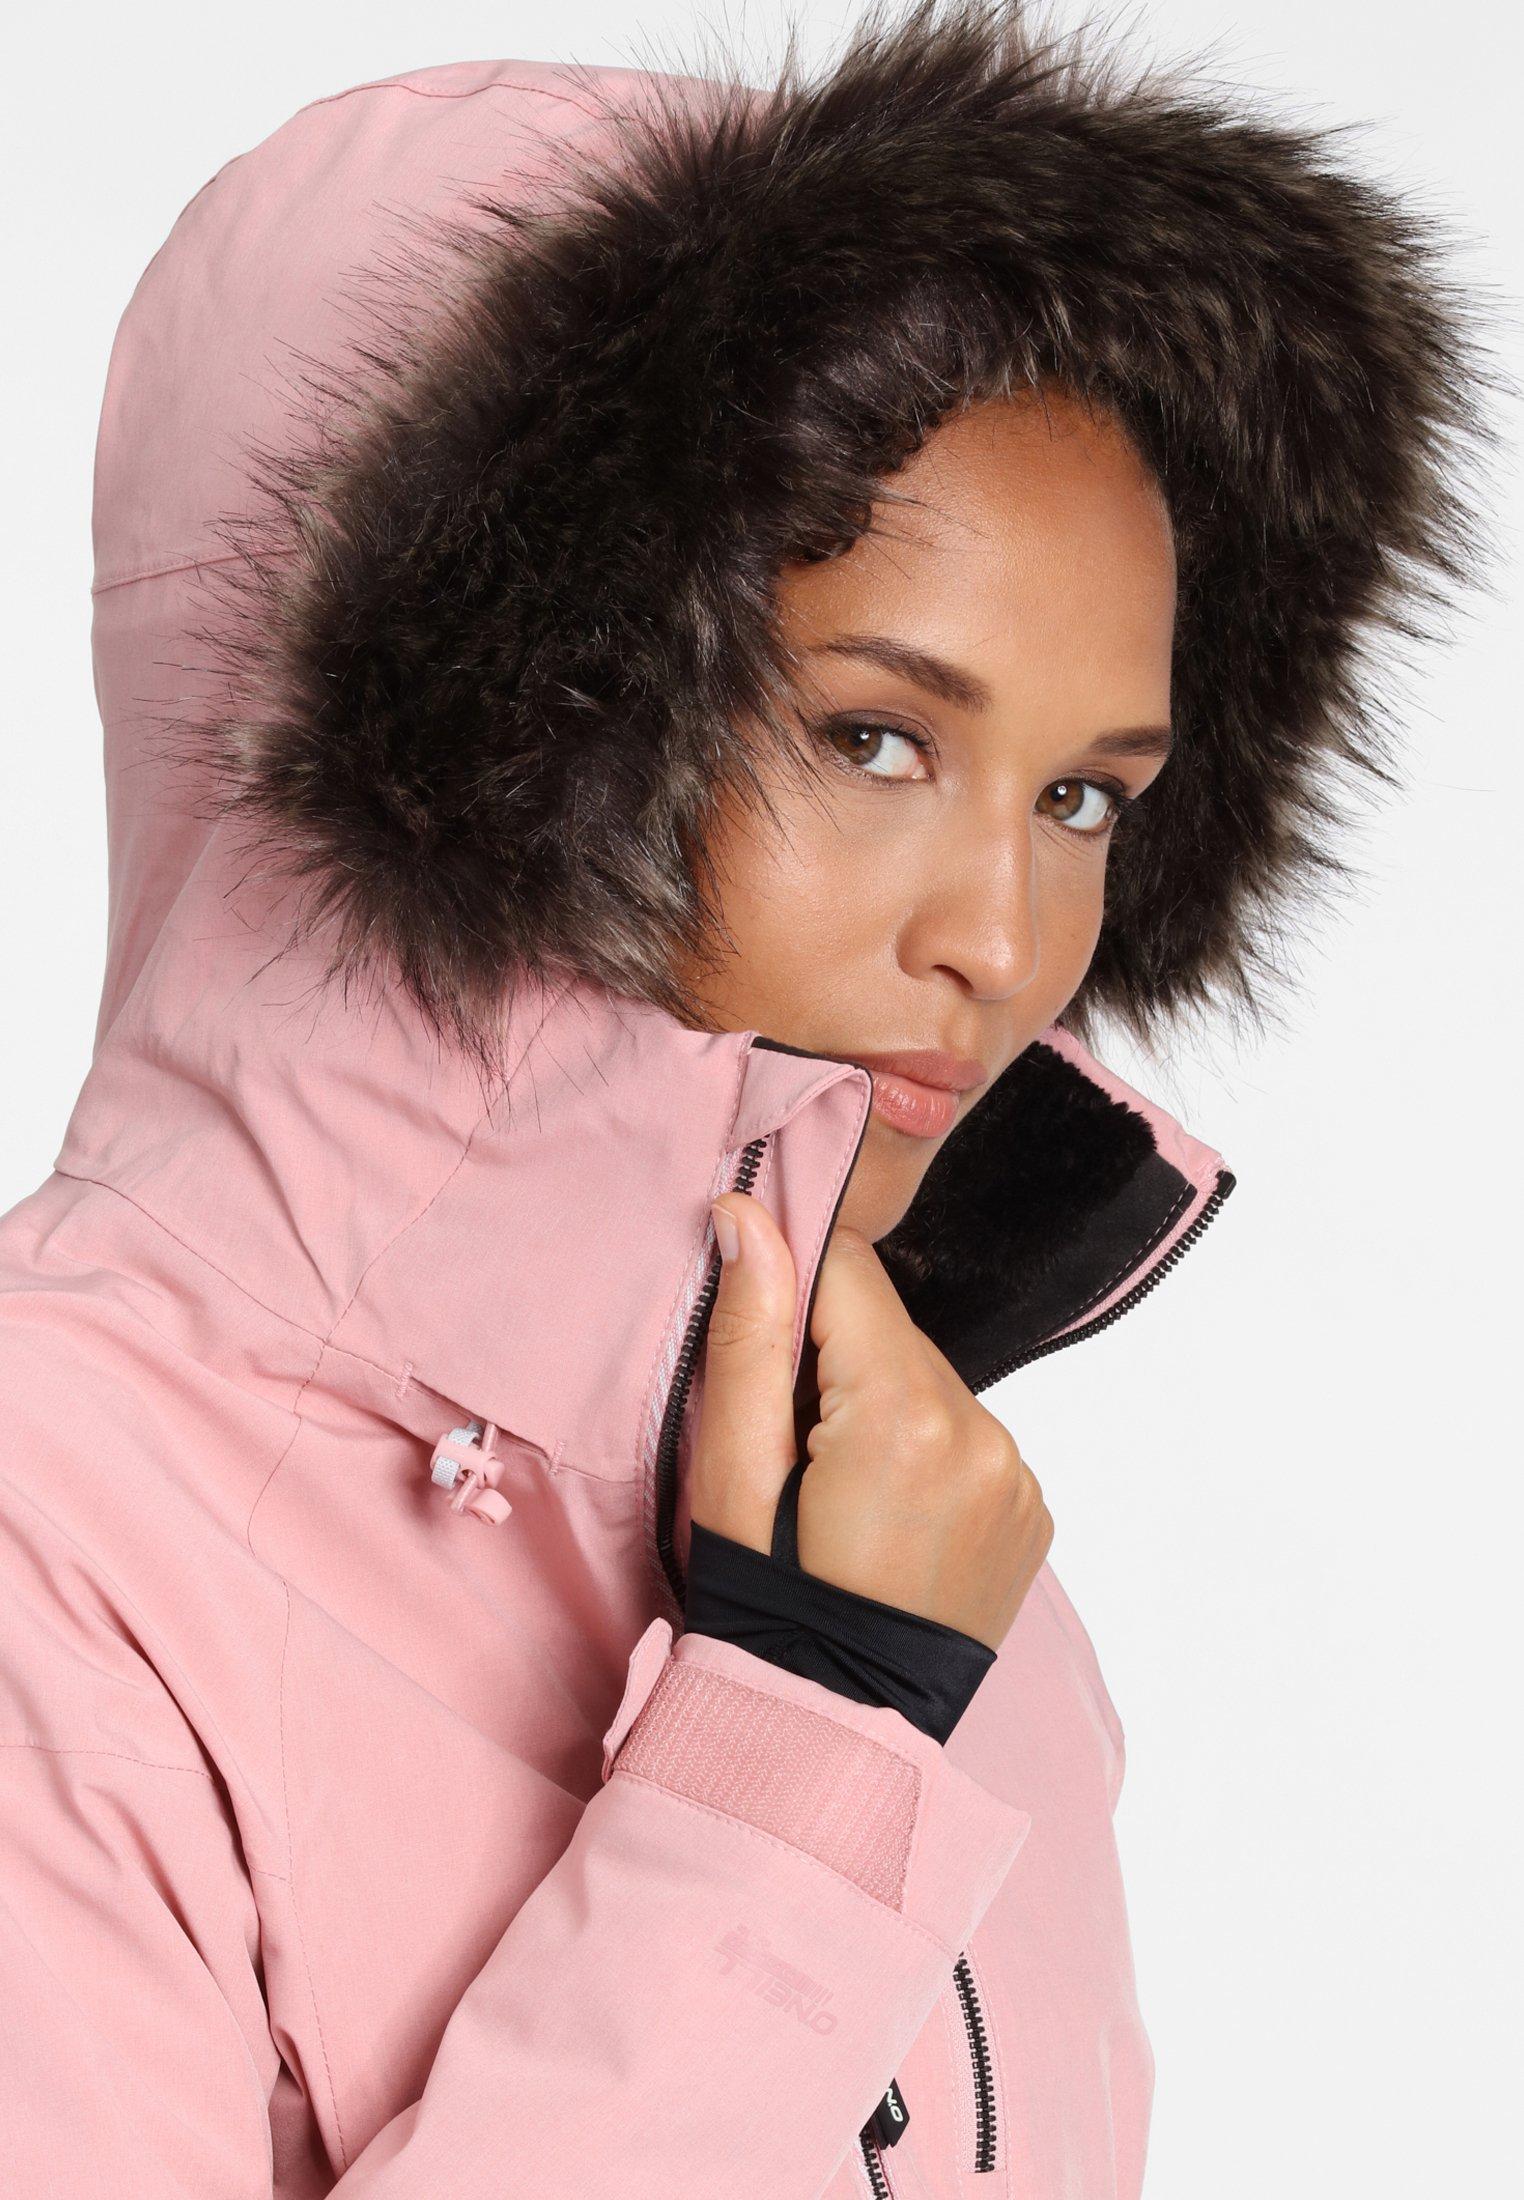 O'neill Vauxite Jacket - Snowboardjas Bridal Rose Hi5XojVJ